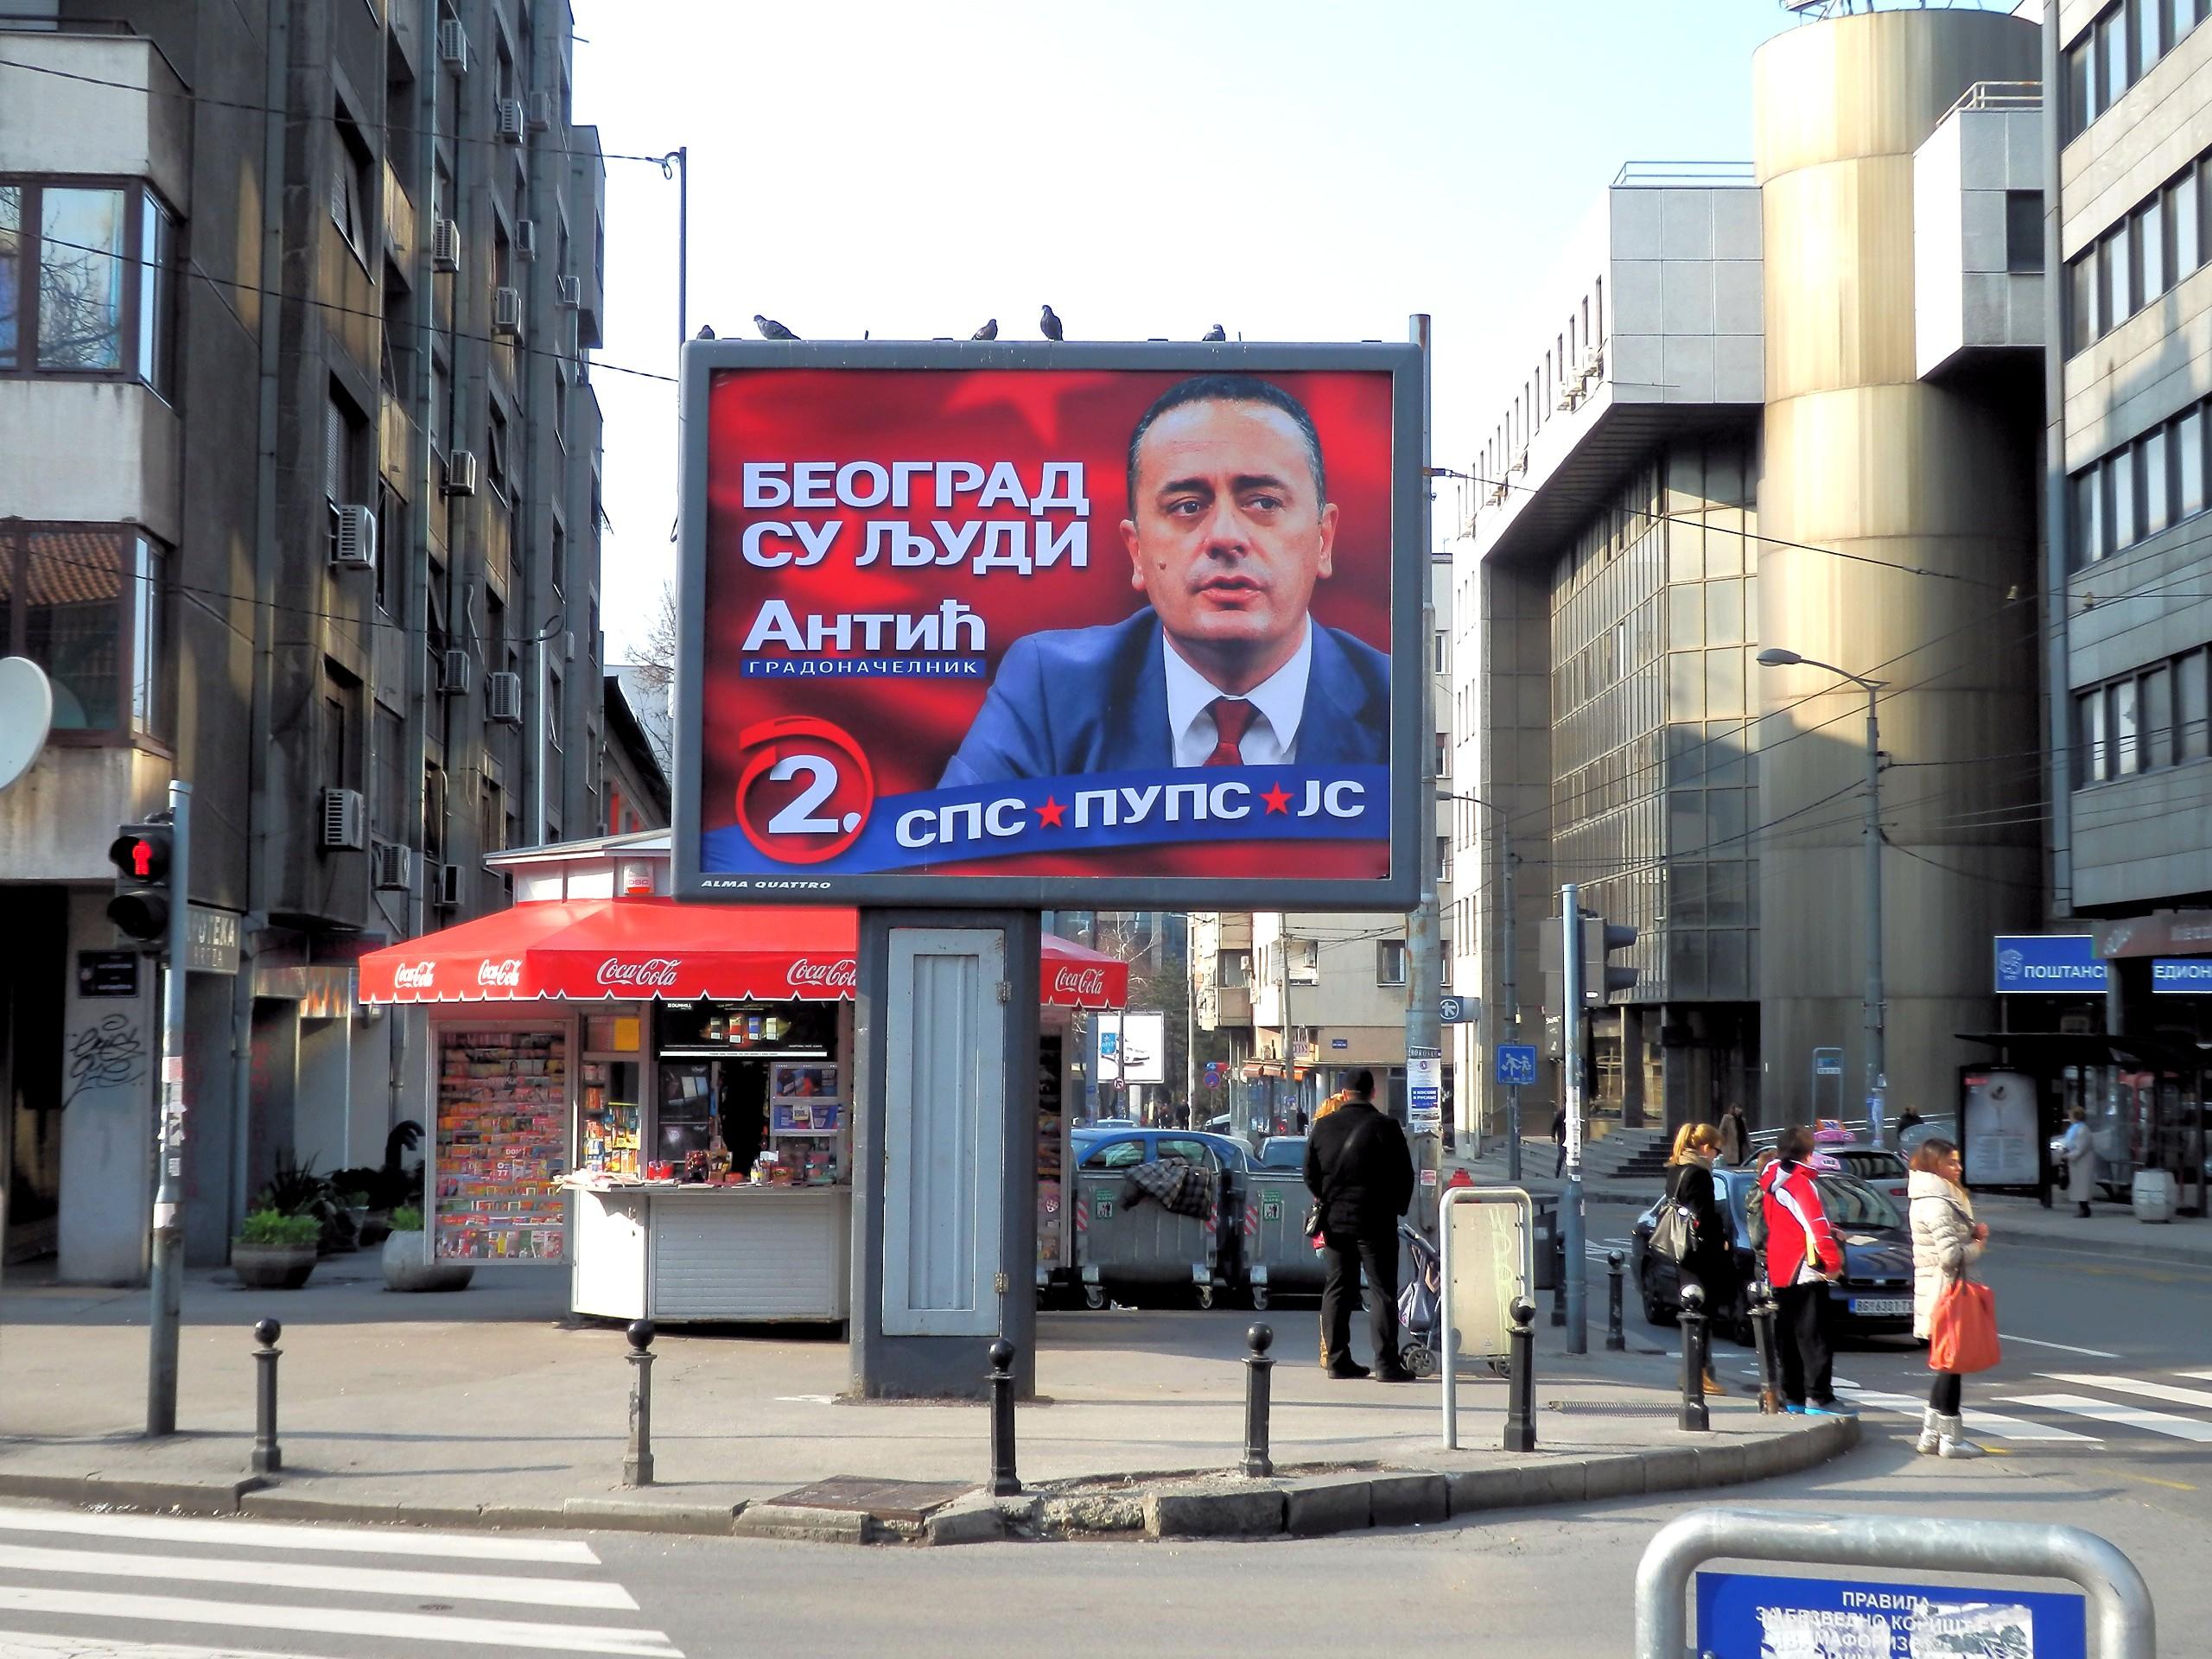 Manifesti elettorali a Belgrado (foto F. Sicurella)